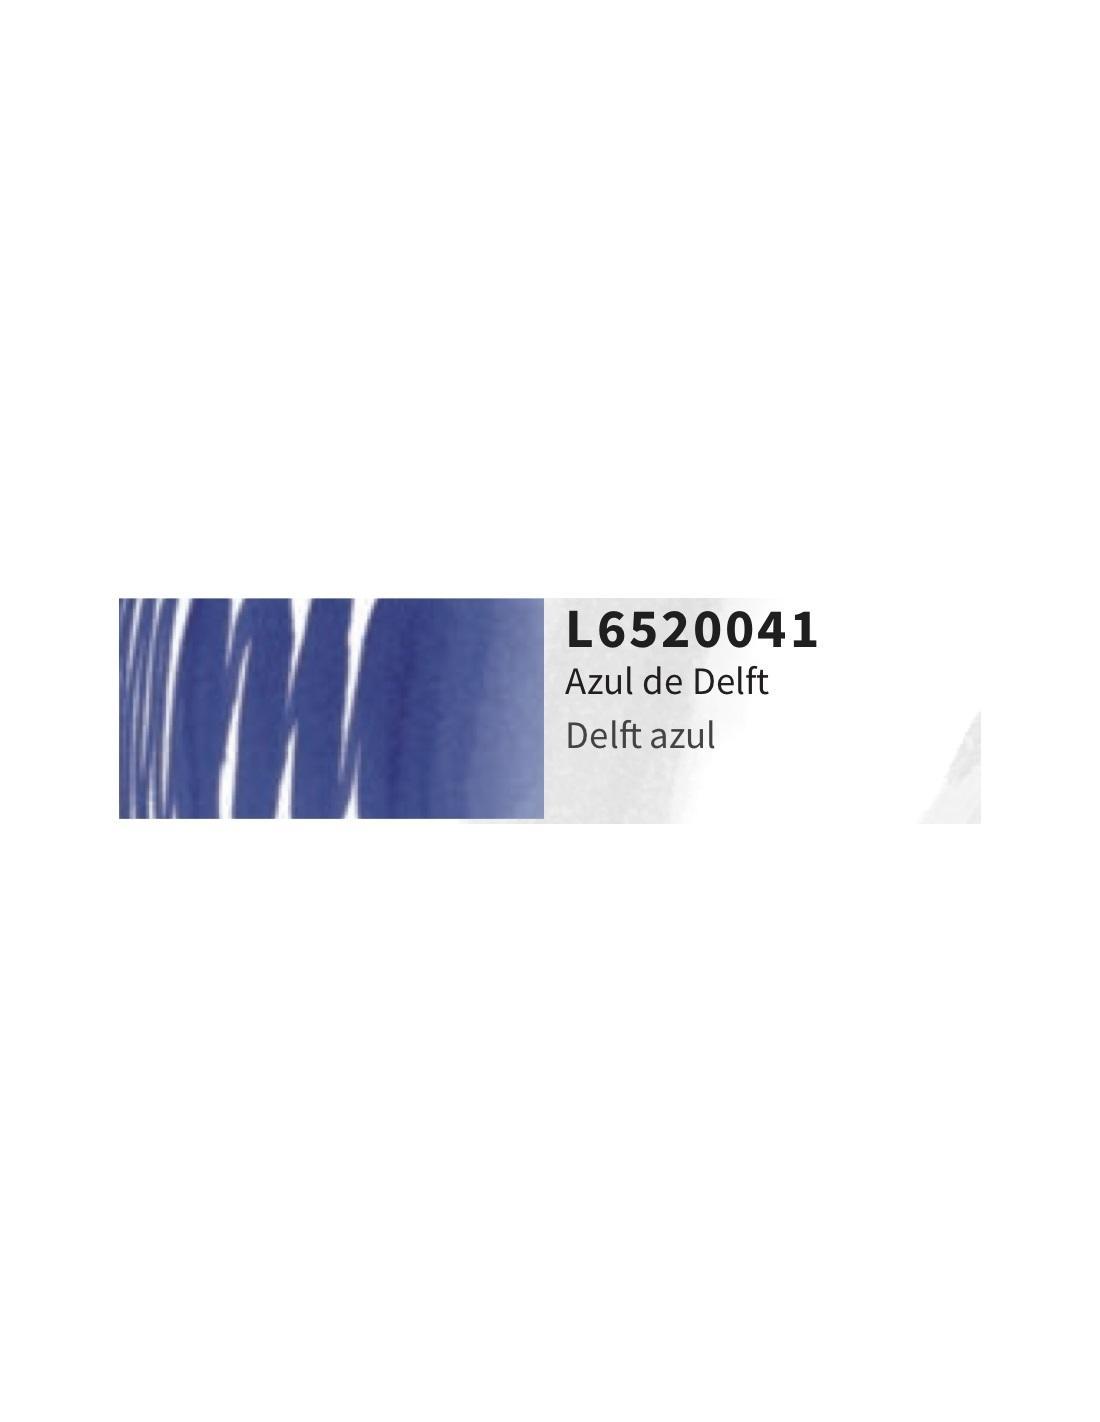 Rotulador Lyra Aqua Brush Duo Azul de Delft